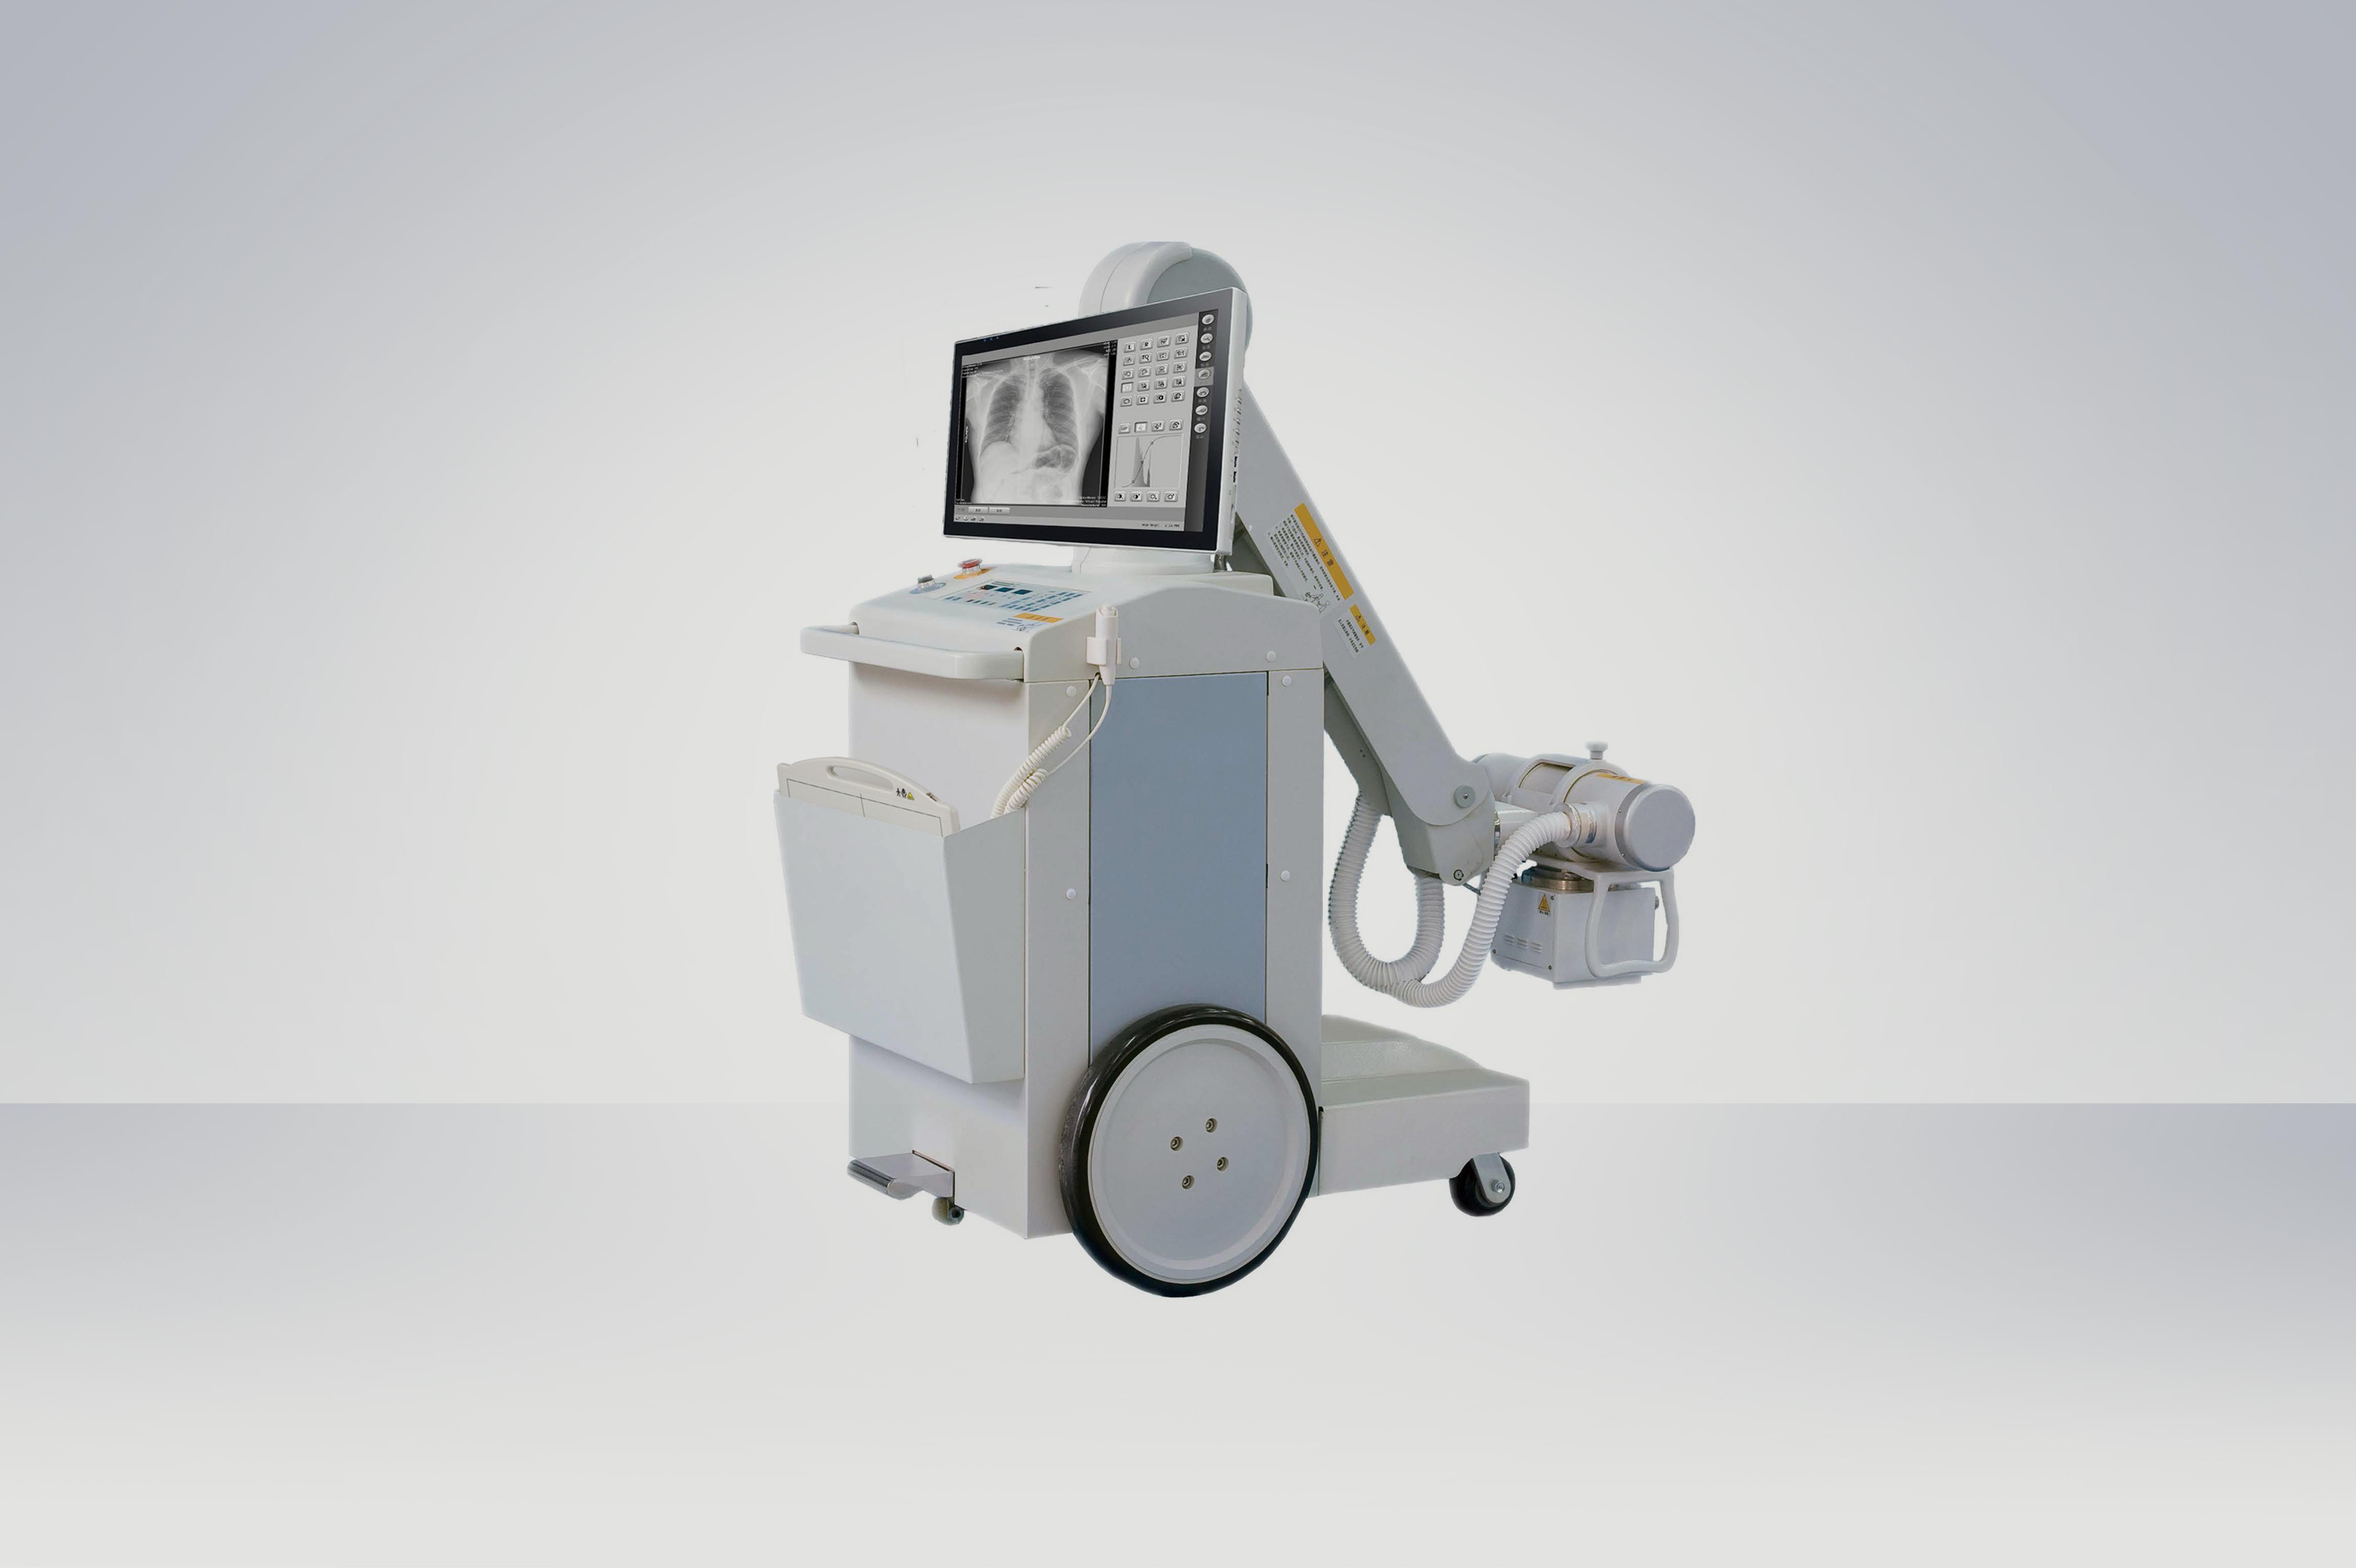 Mobile Digital Medical Diagnostic X-Ray System